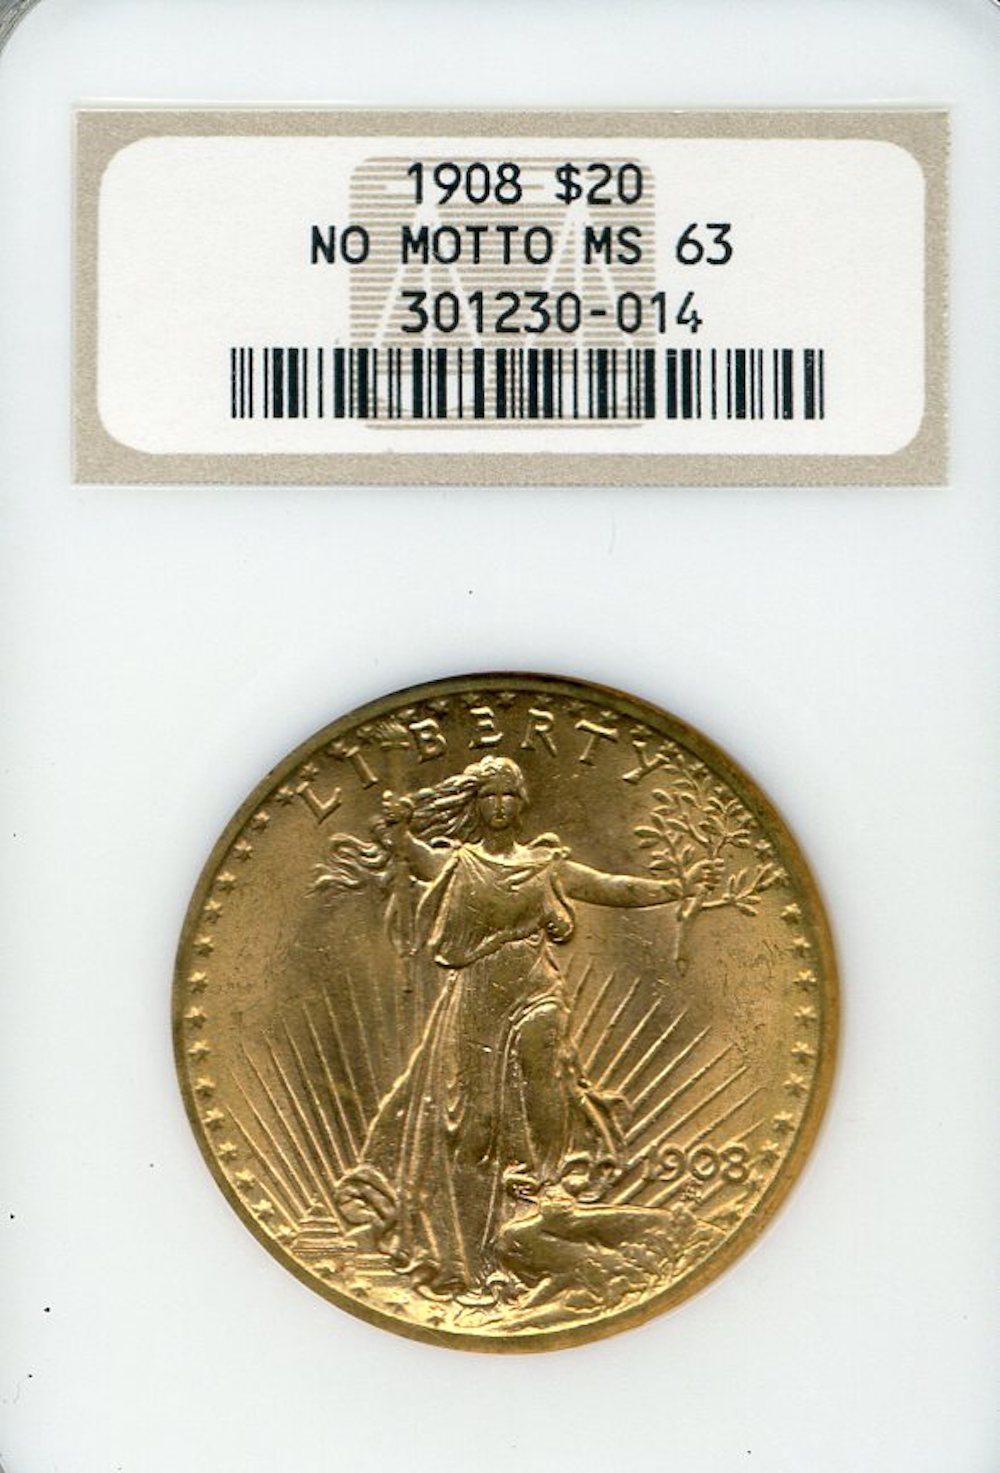 1908 $20.00 Gold Saint Gaudens No Motto